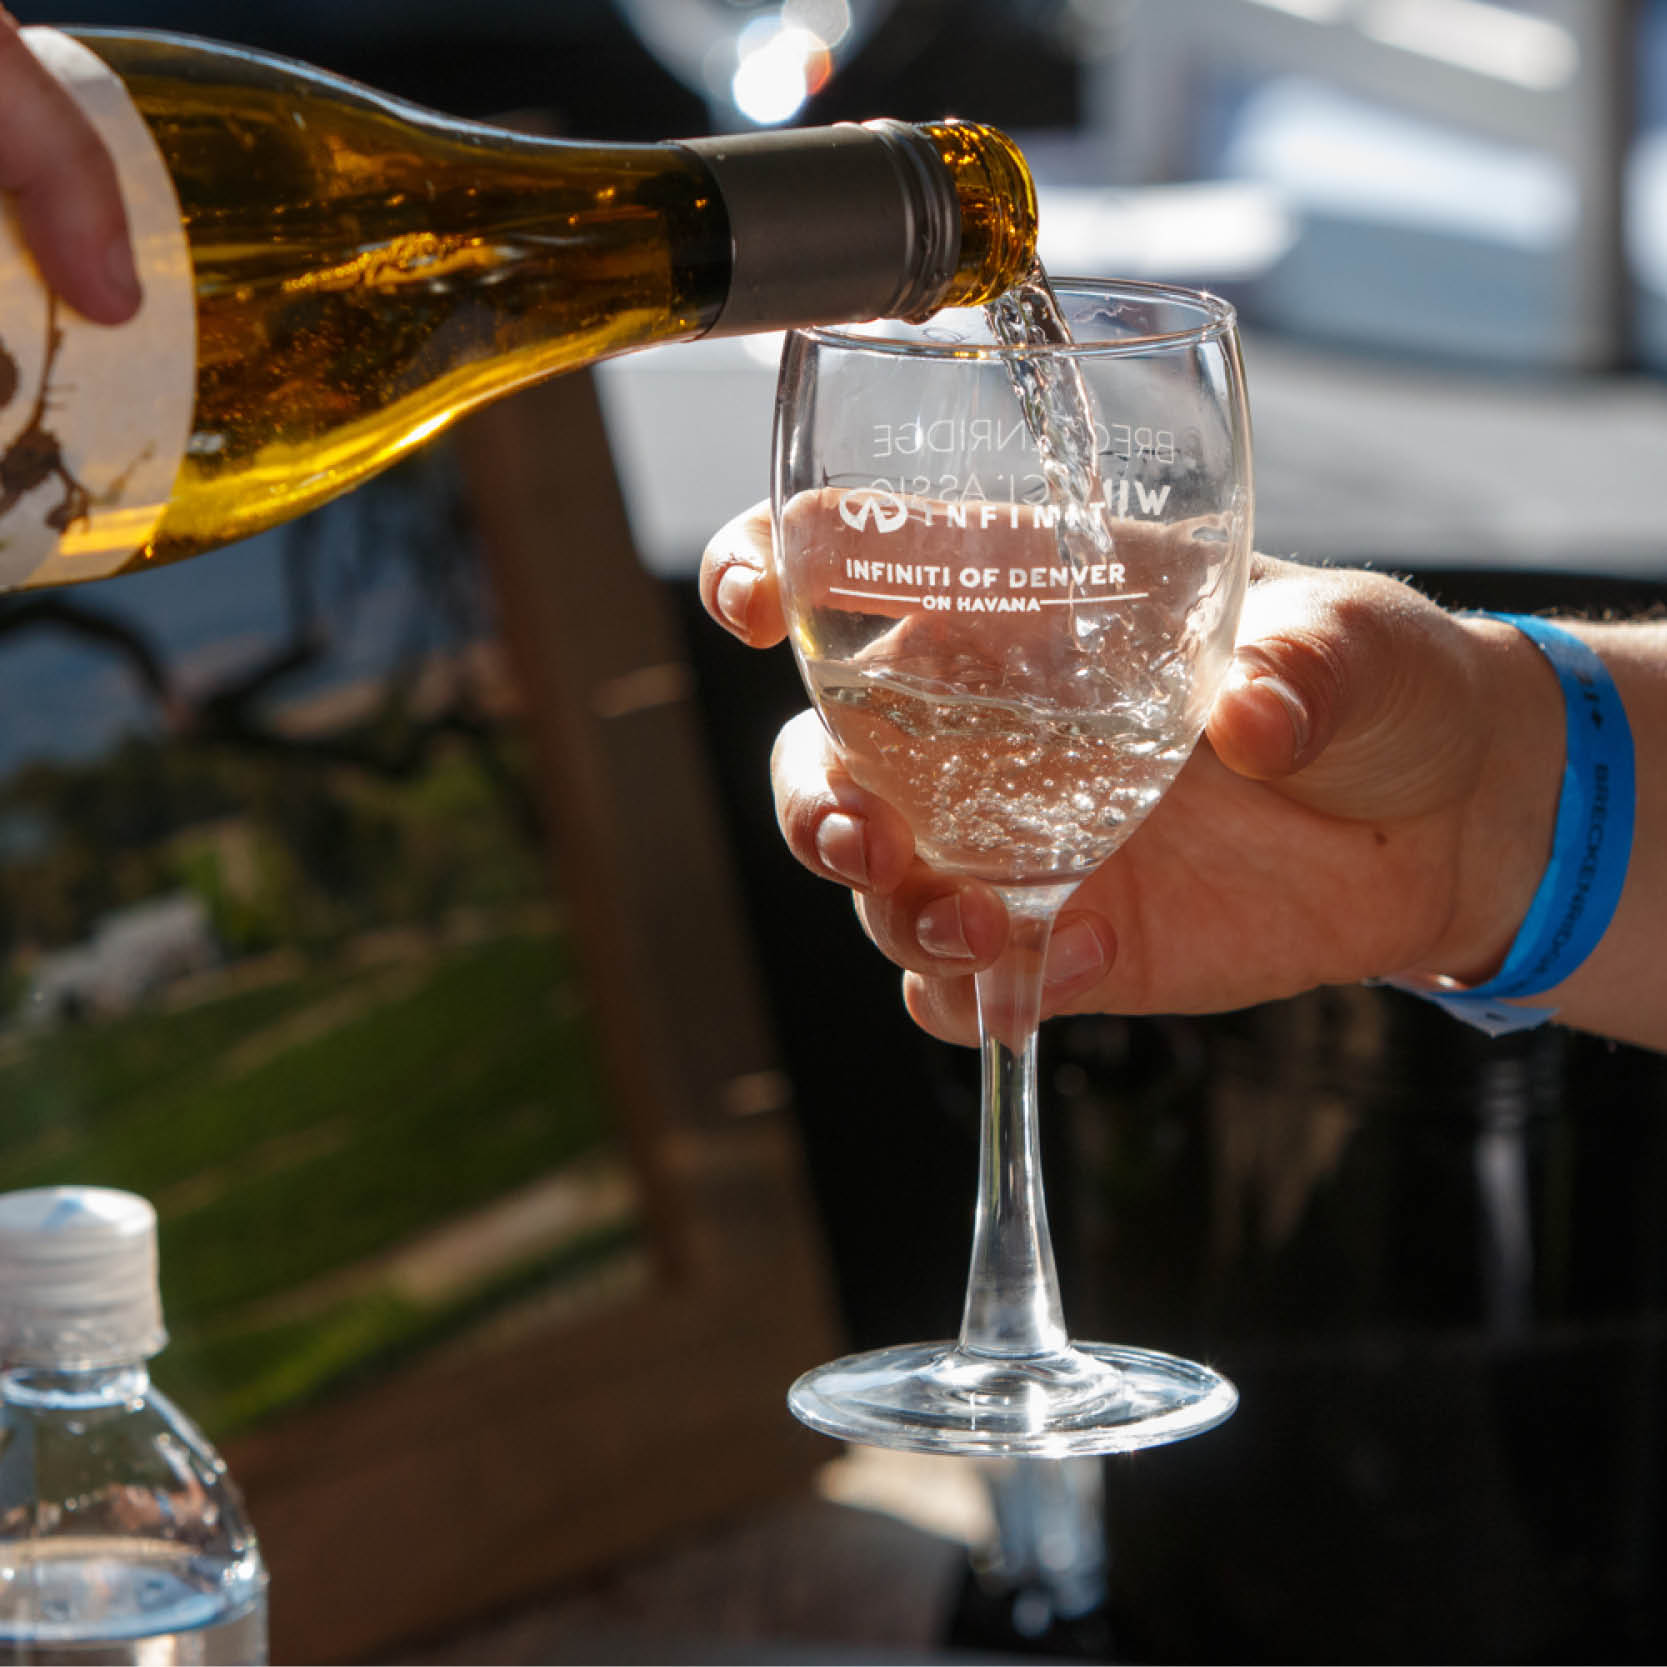 Tasting wine at Vail Wine Classic